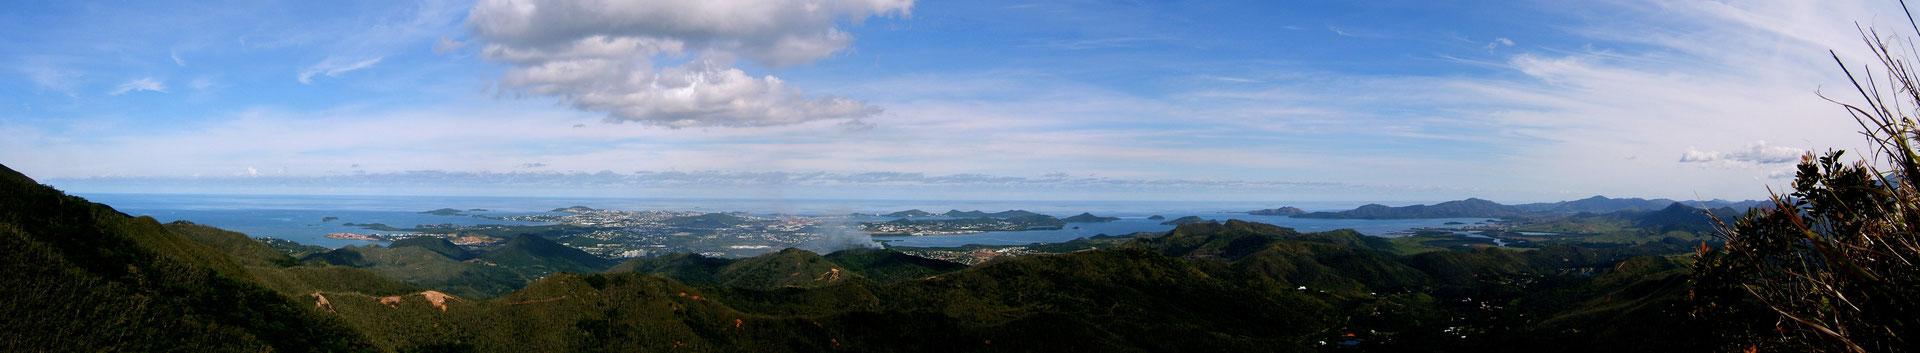 Panorama, Nouméa, Nouvelle Caledonie, NC,   JPG